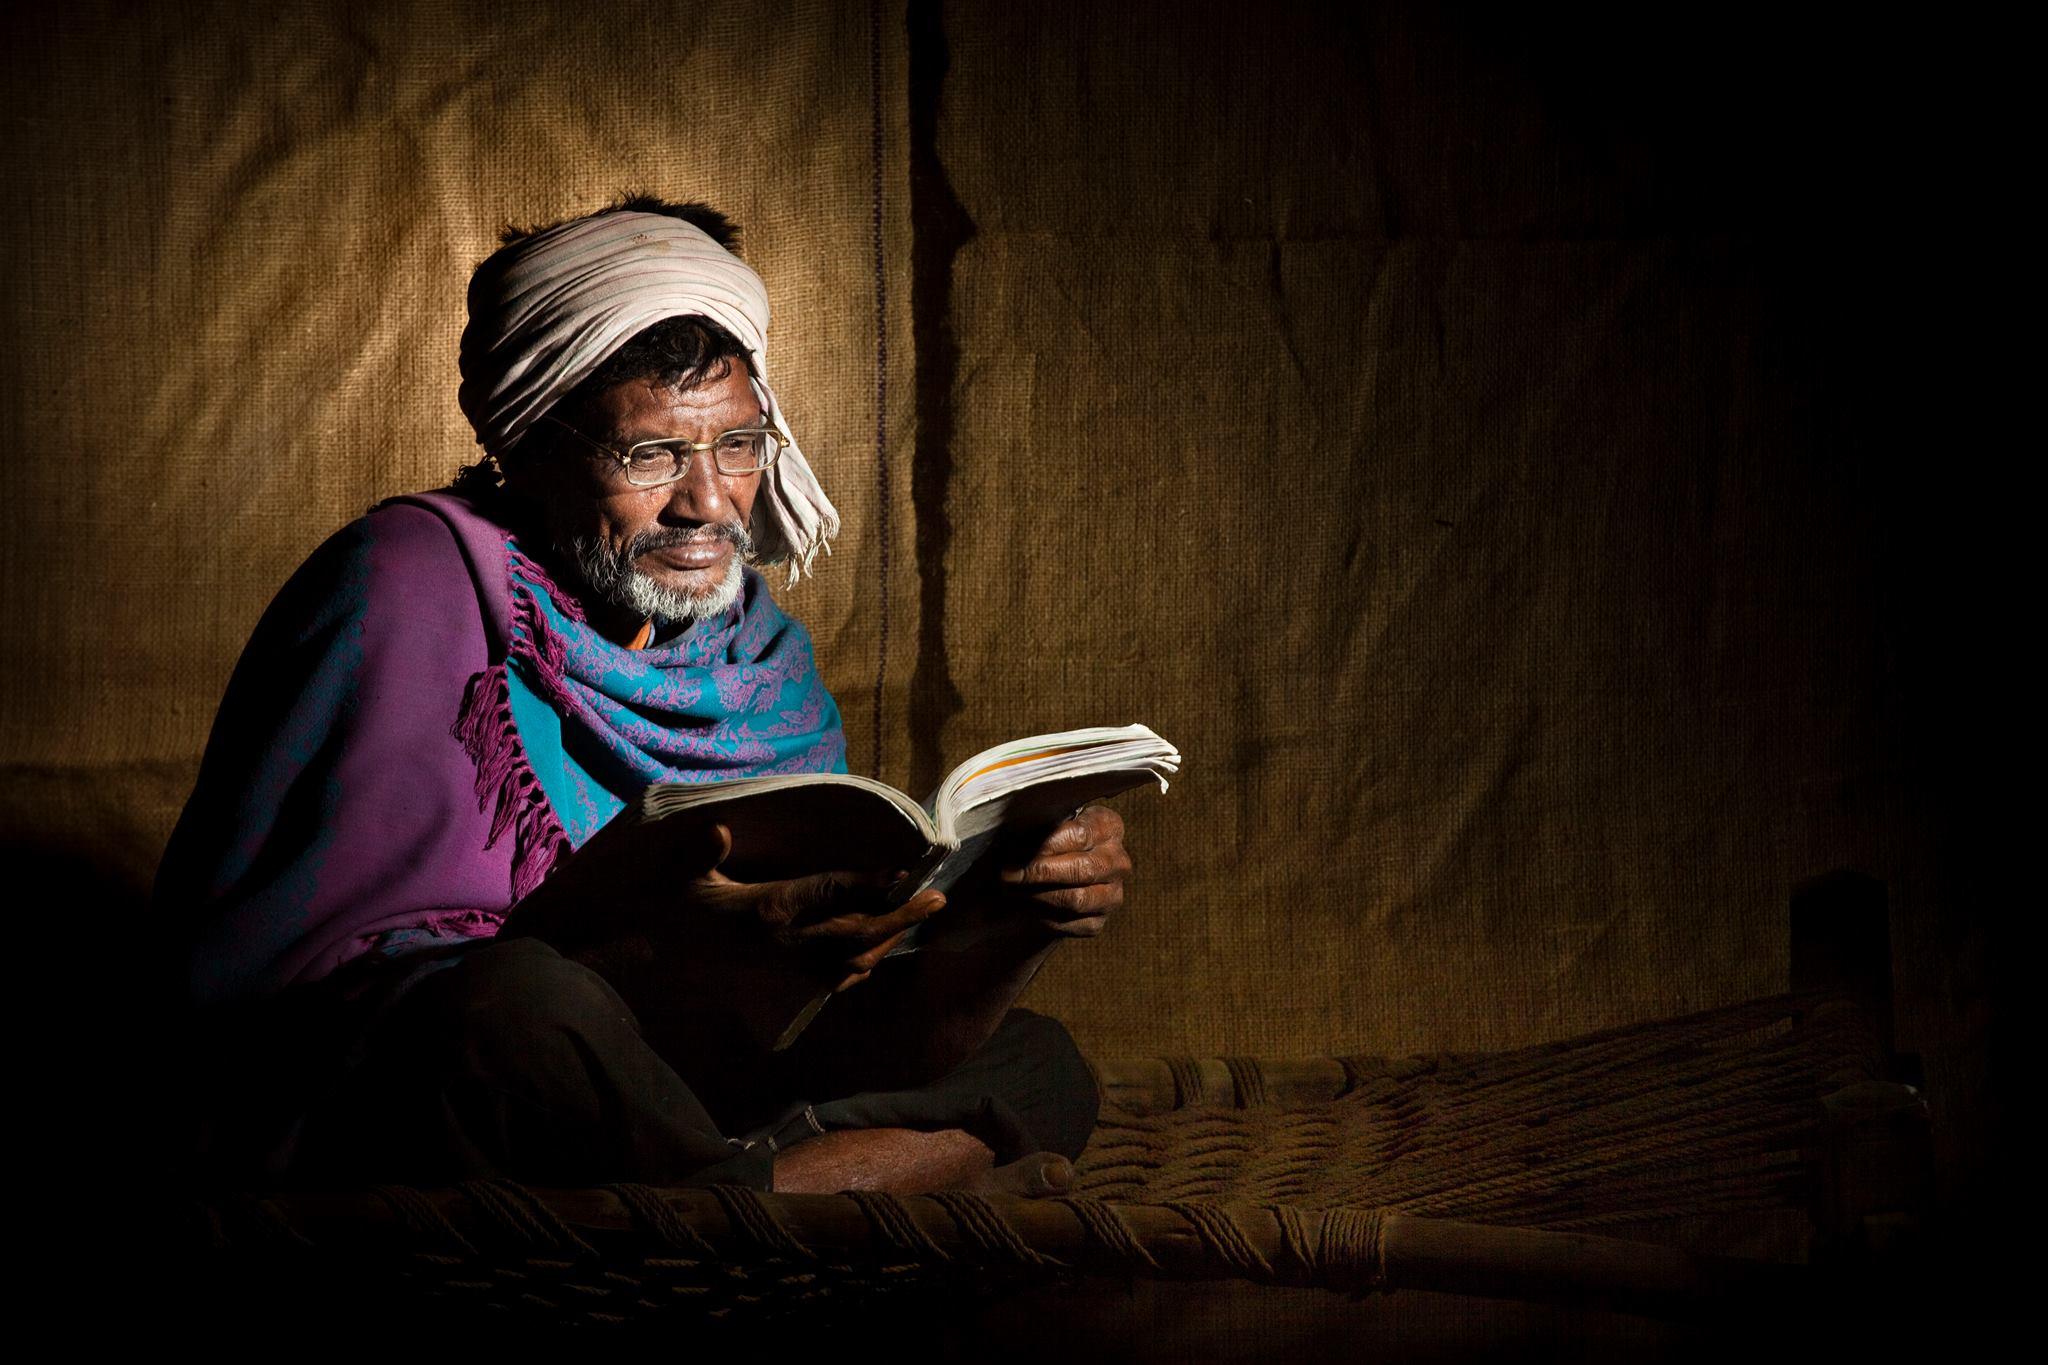 Transformation trends: from terrorist to Bible translator